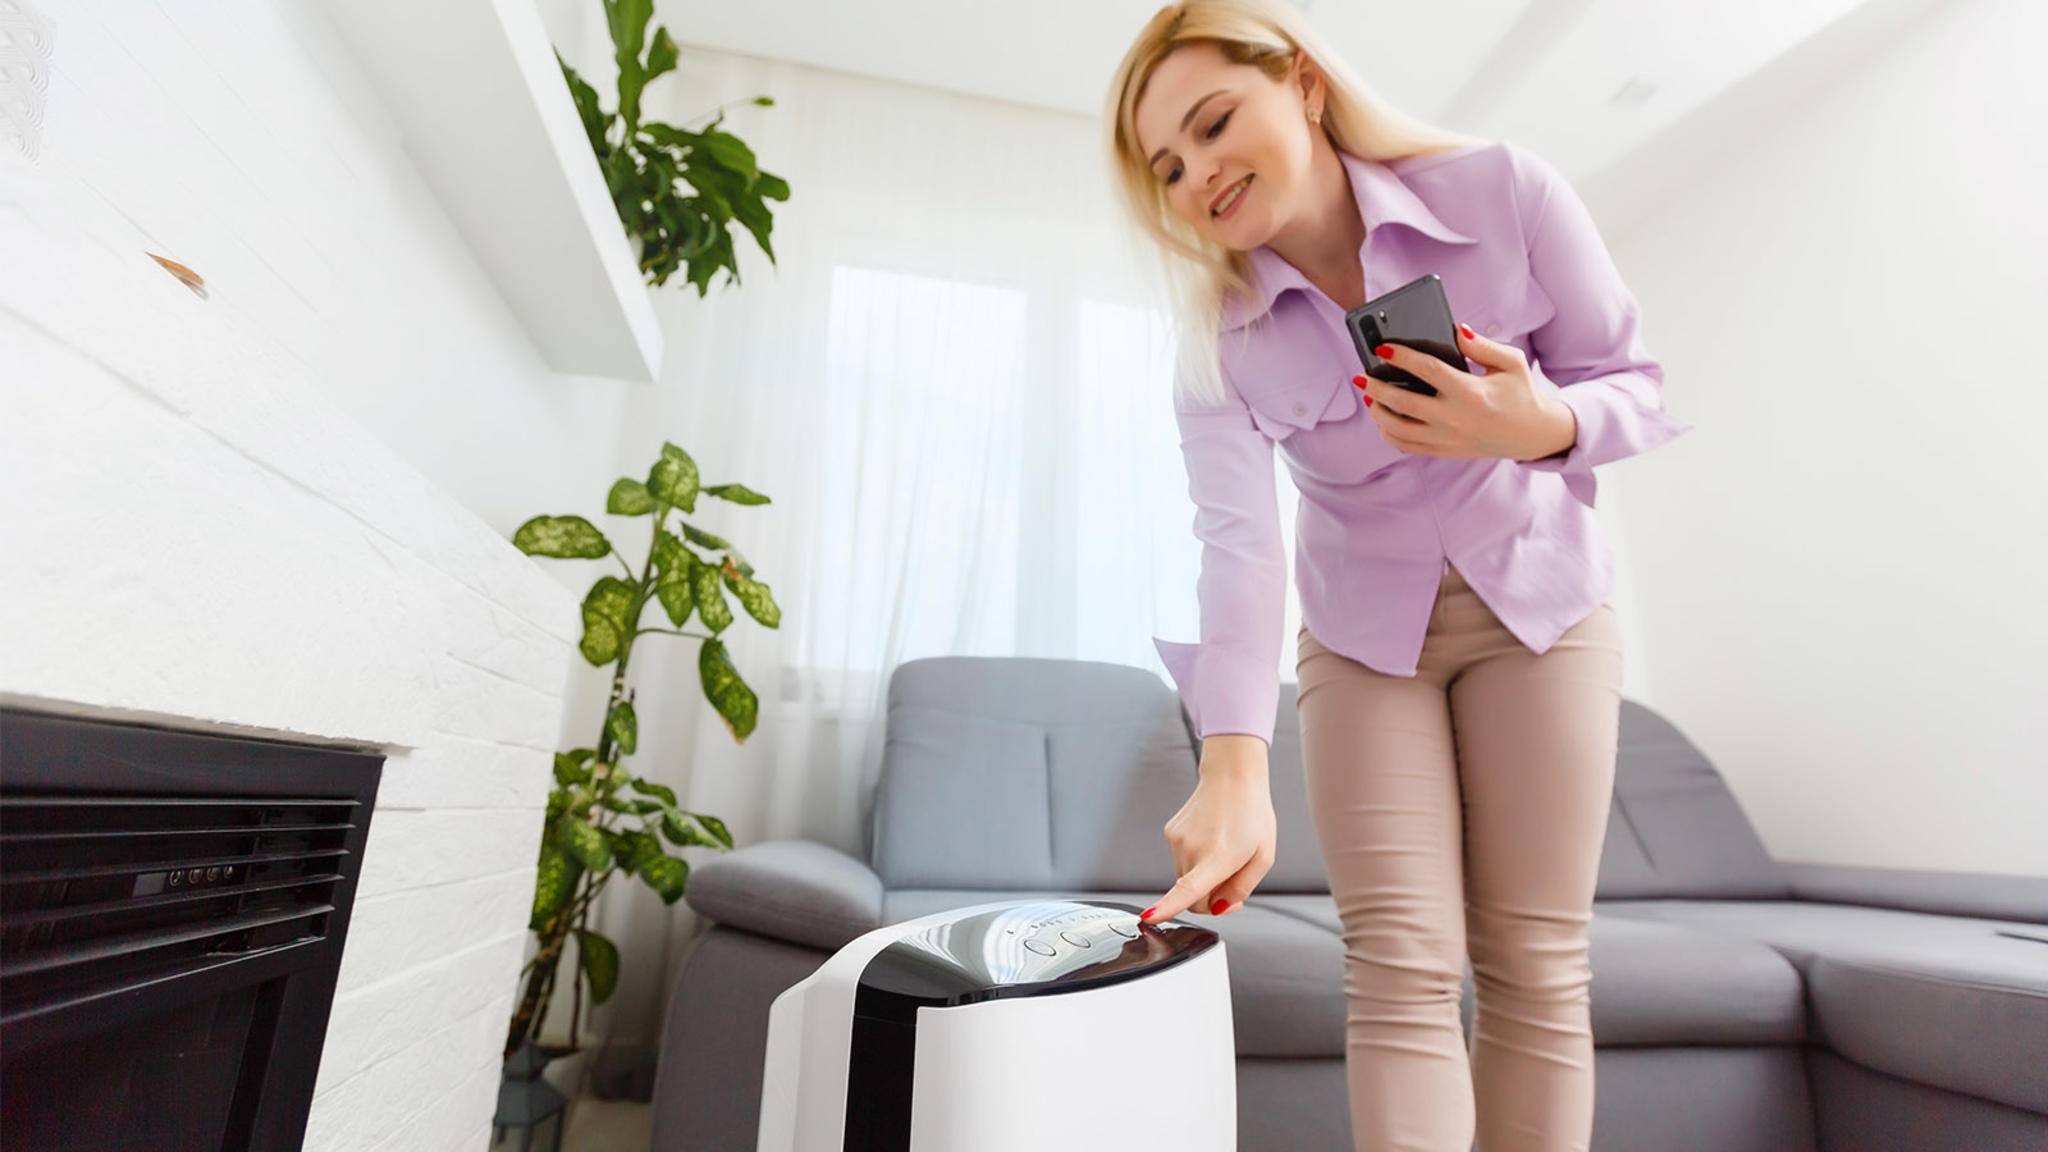 Frau bedient Klimagerät mit Smartphone